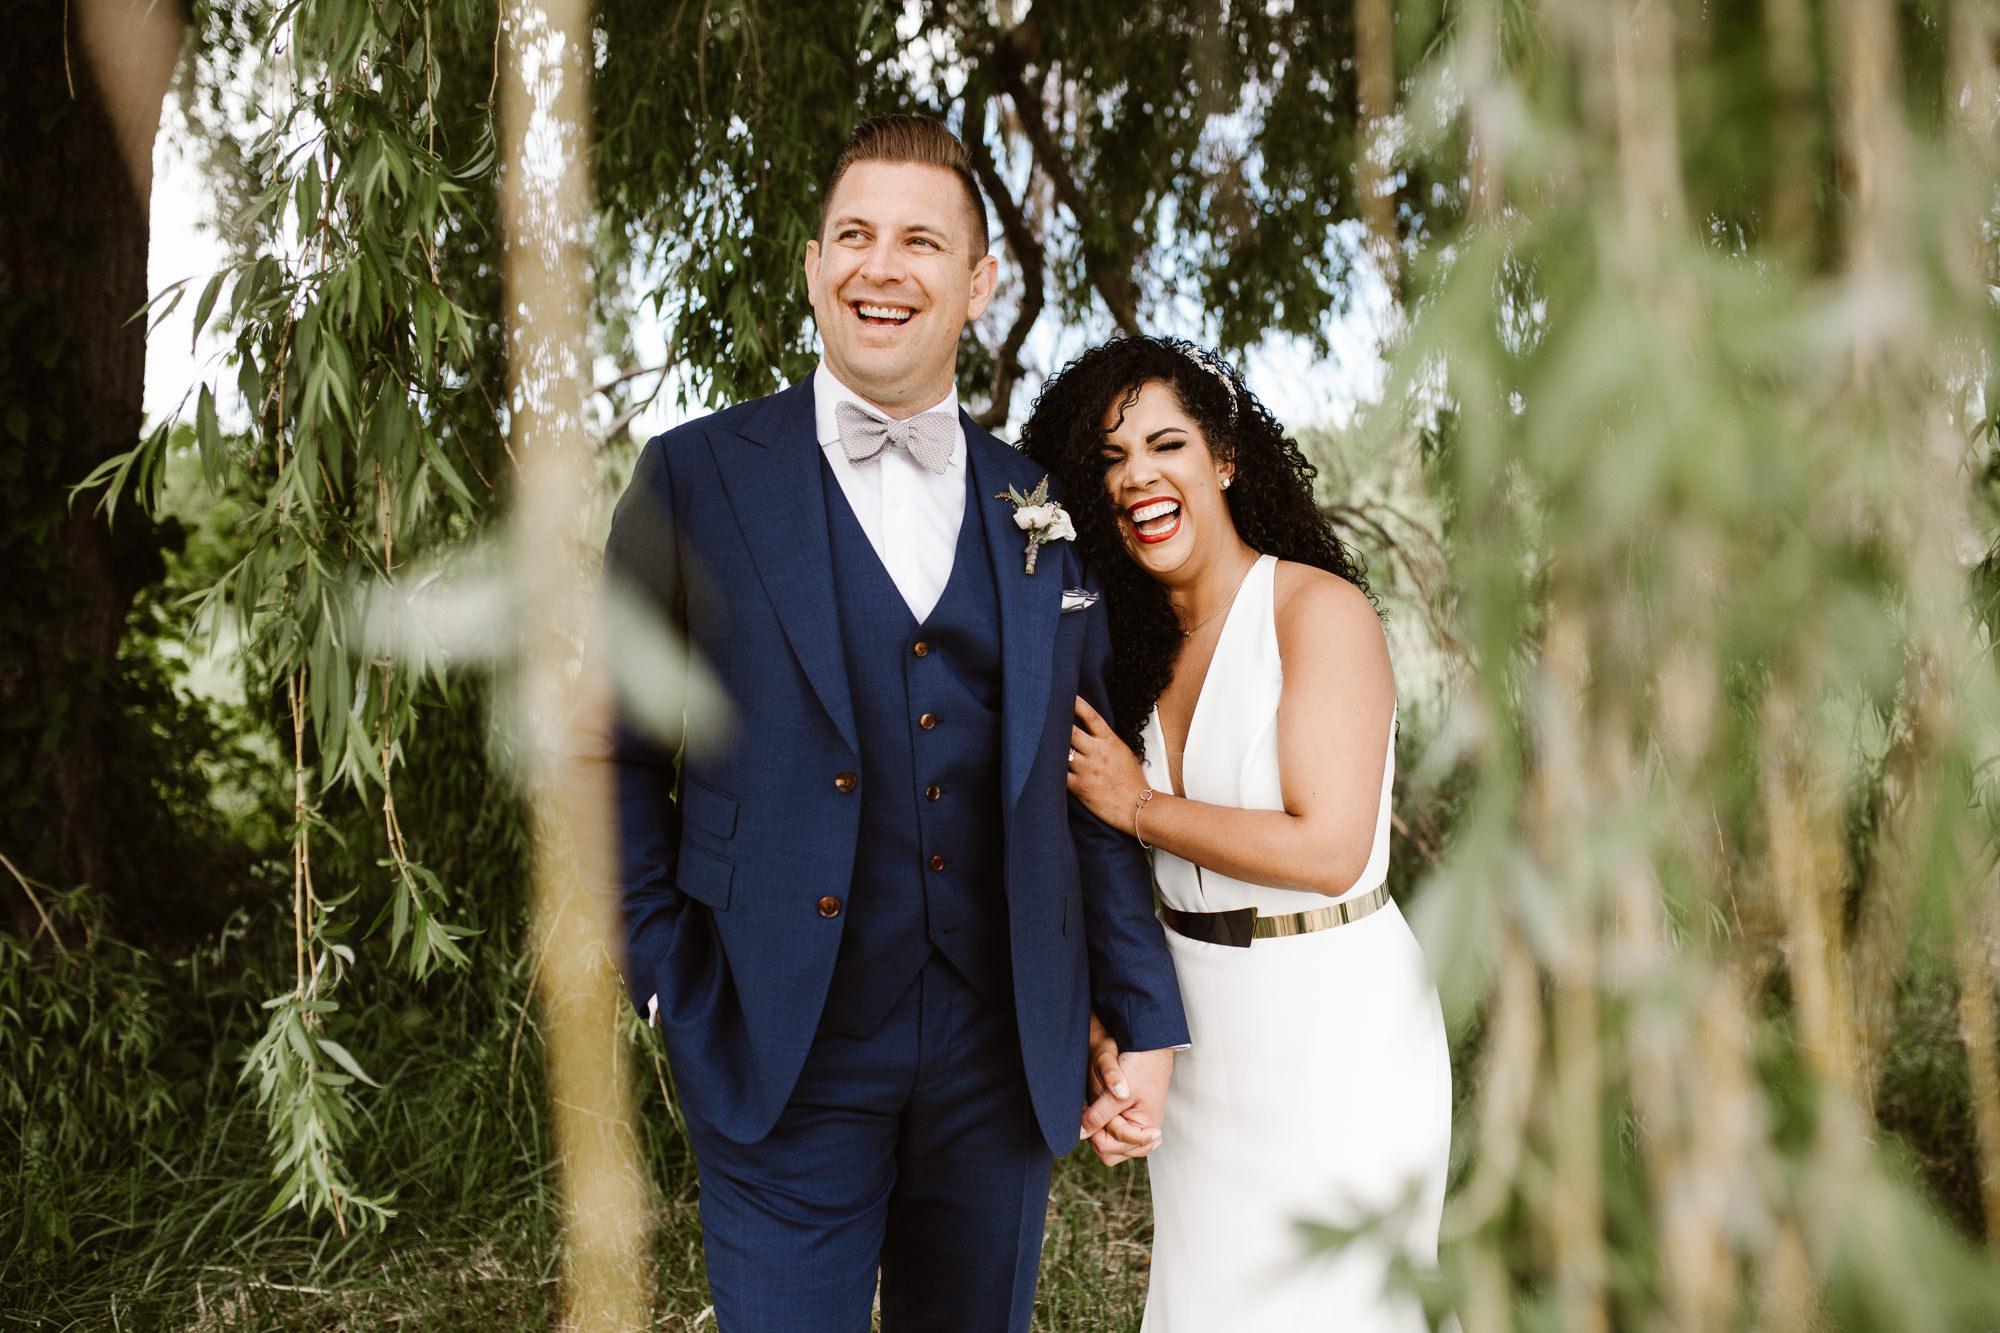 stratus-winery-wedding-vineyard-wedding-vineyard-bride-photo-by-reed-photography-031.jpg